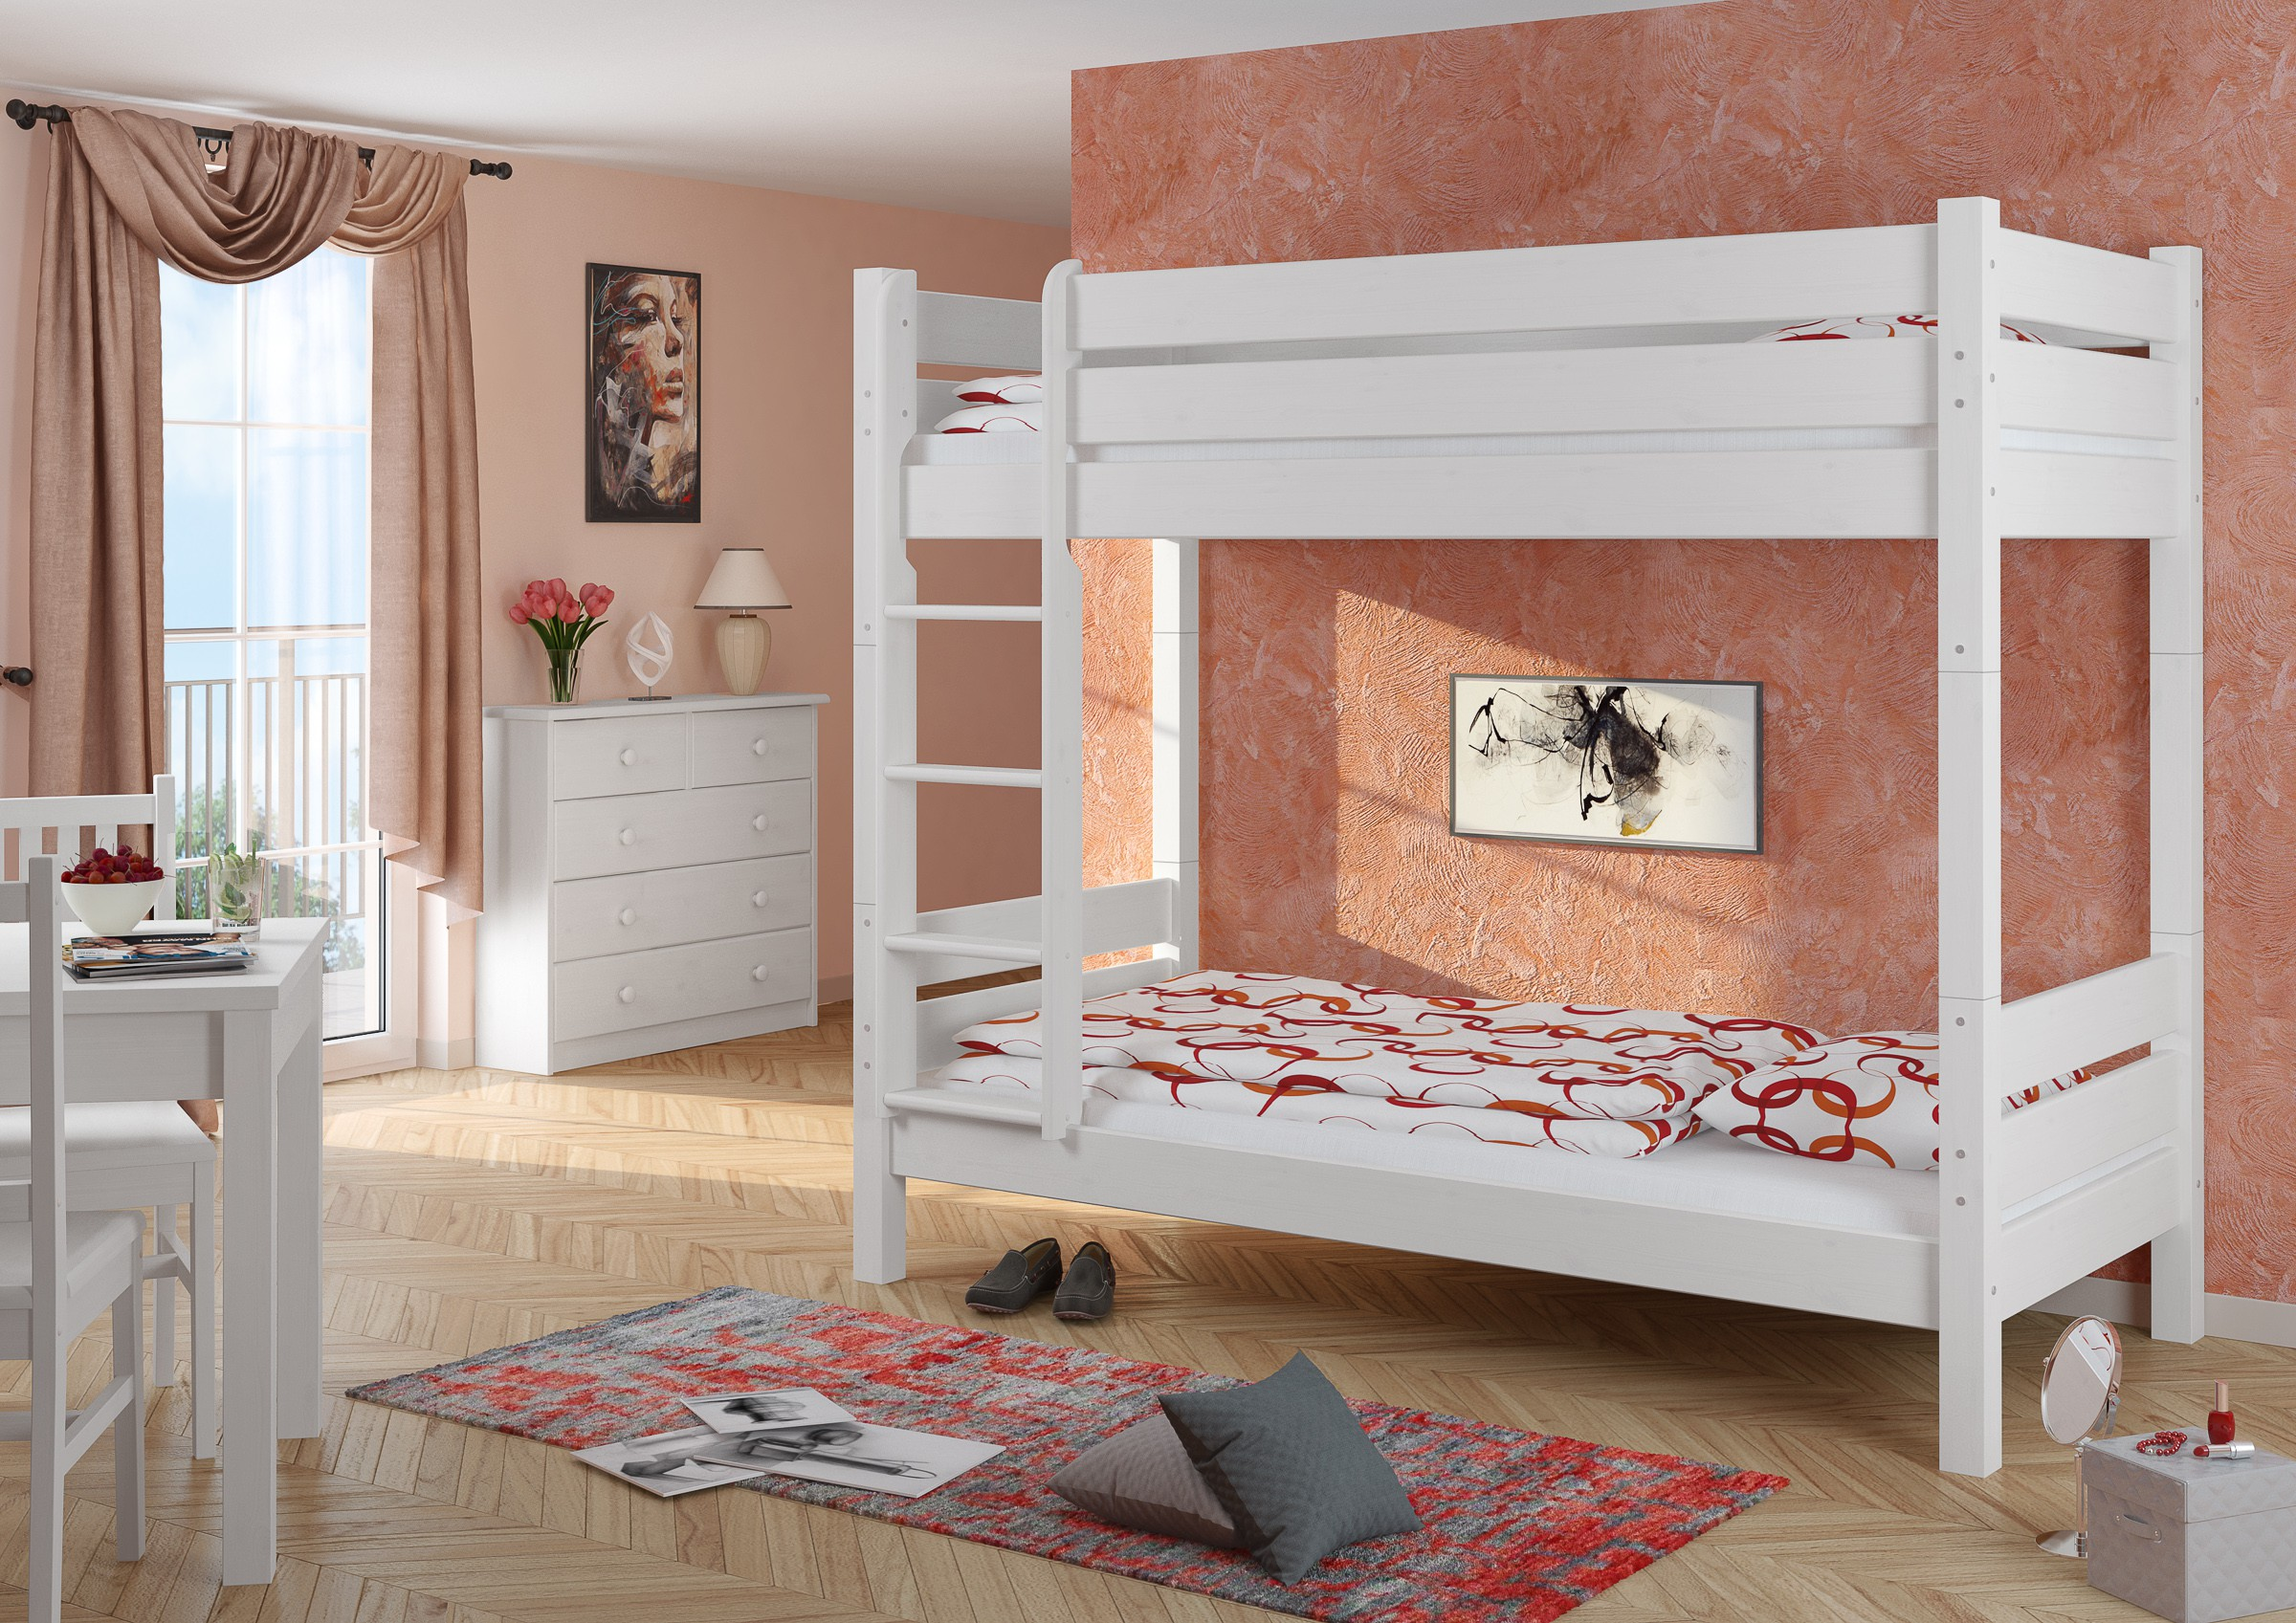 hochbett etagenbett wei 90x200 teilbar 2 rollroste. Black Bedroom Furniture Sets. Home Design Ideas